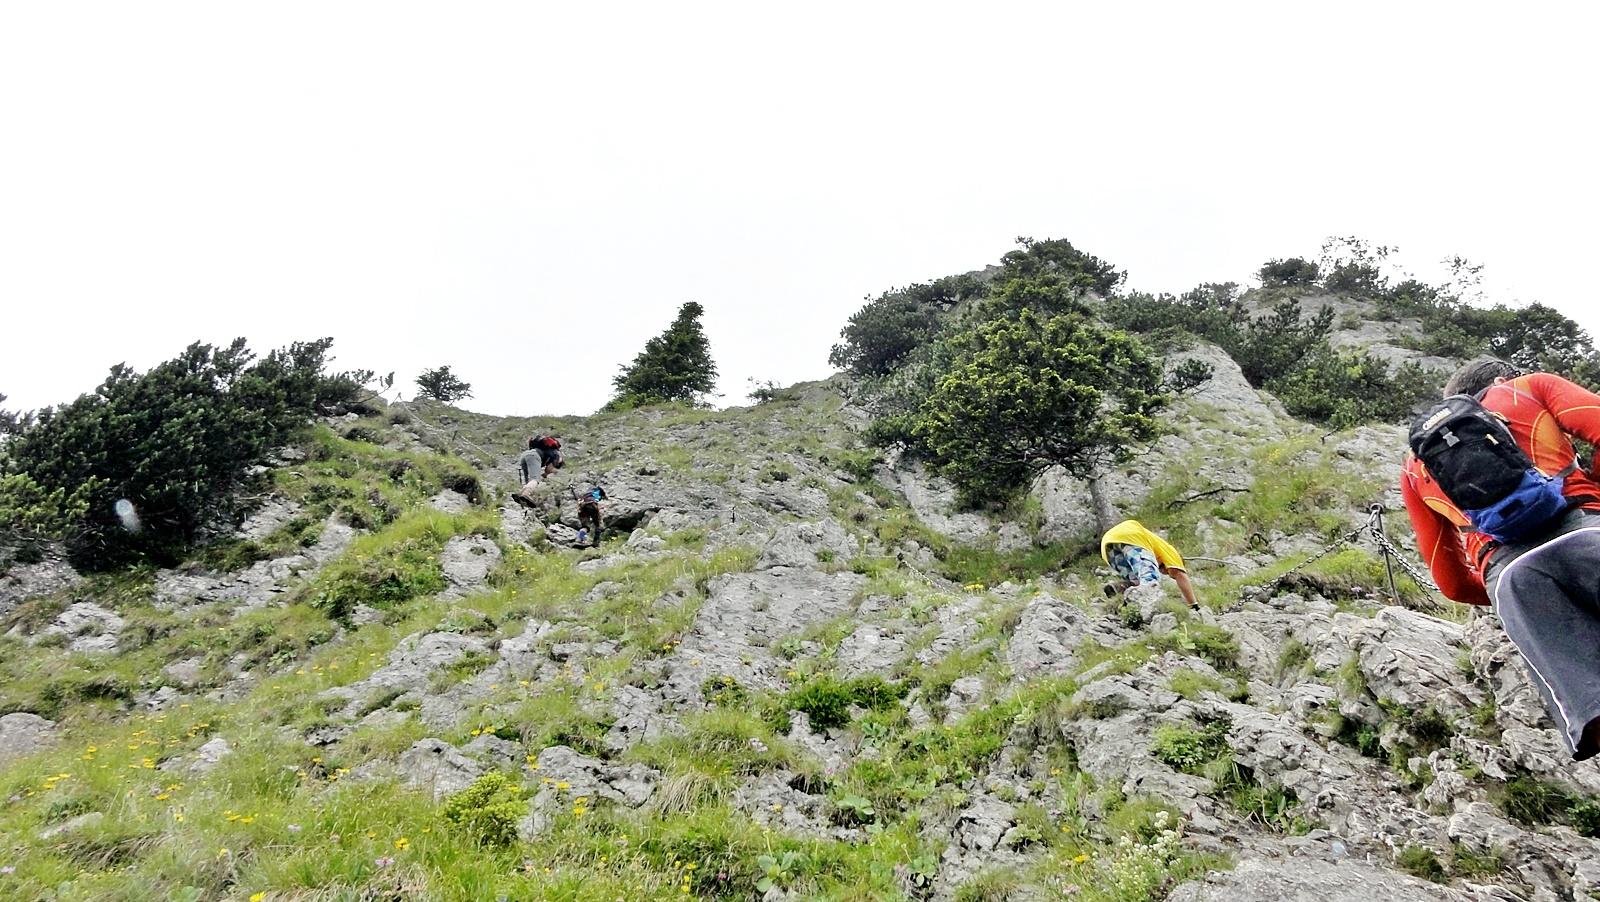 Ettaler Mandl Klettersteig Unfall : Ettaler mandl klettersteig a b 780hm 3:30h klettersteige